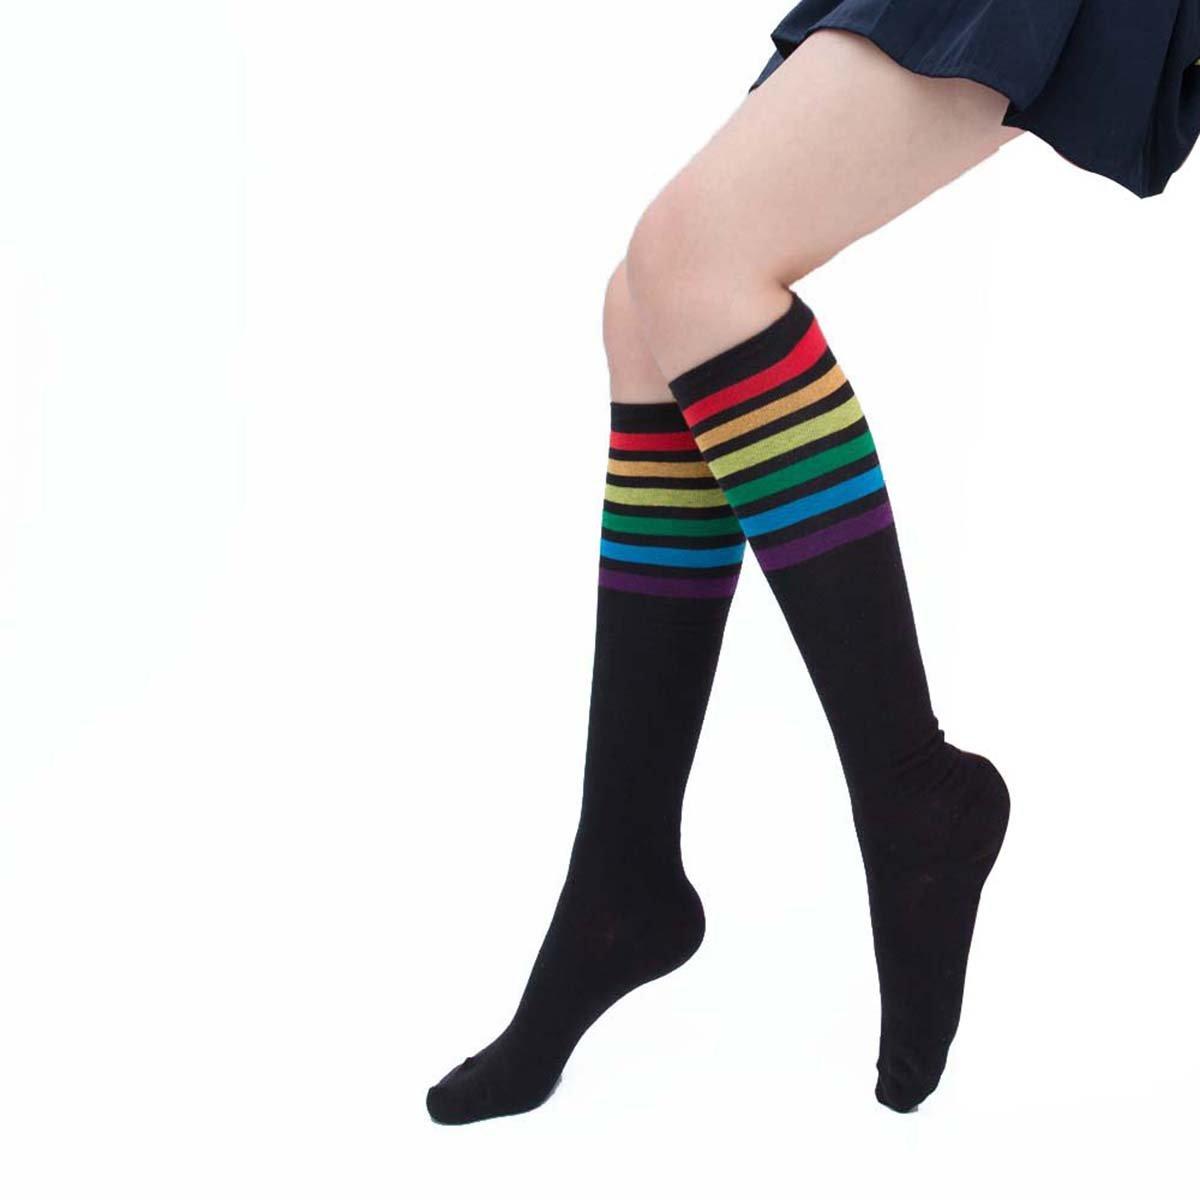 c25a78043 Amazon.com  Rainbow Socks